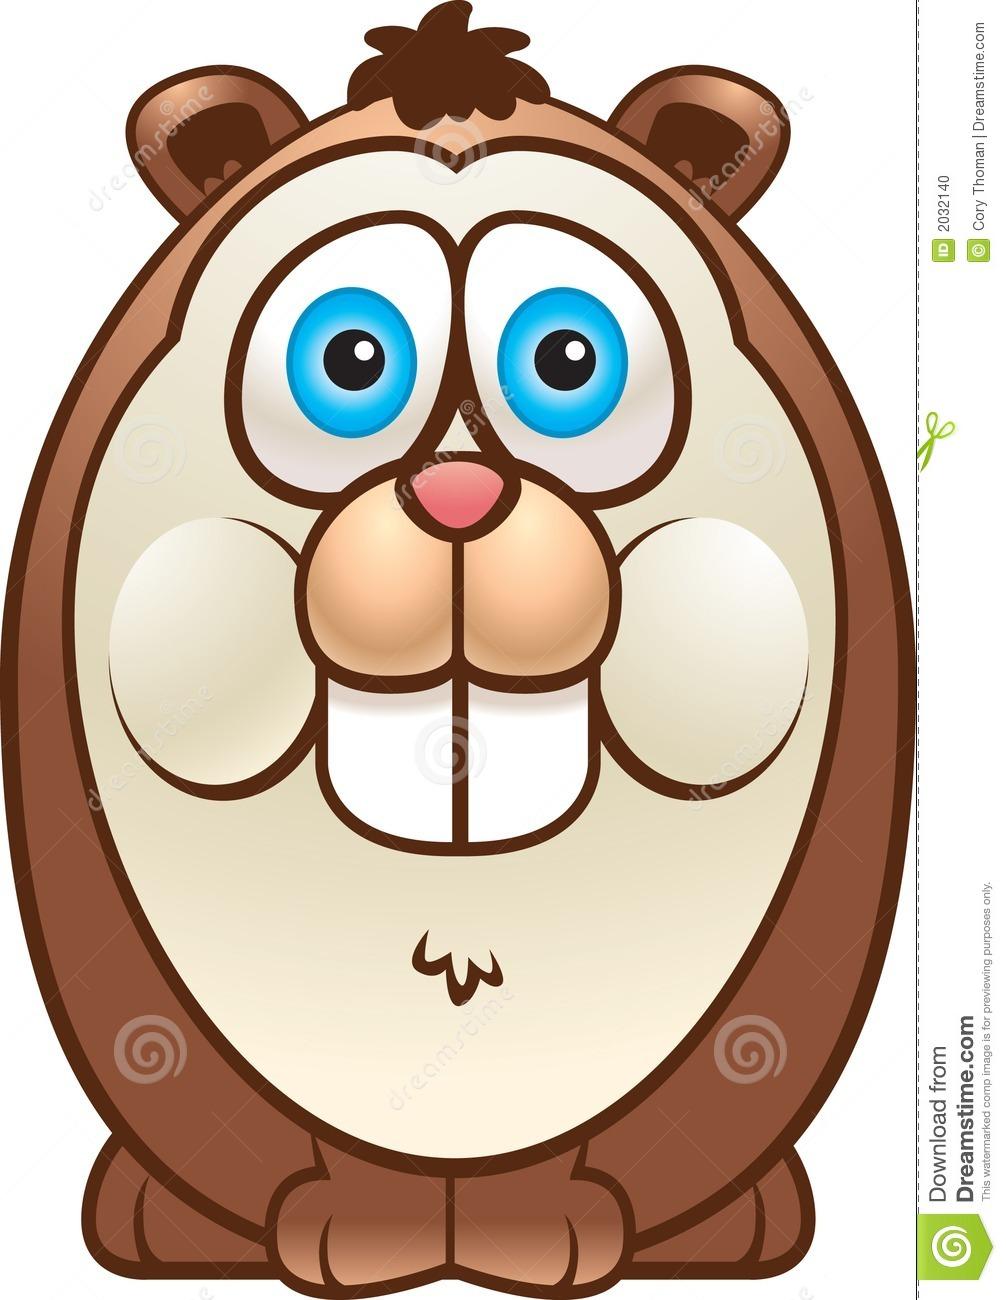 Guinea Pig Clip Art Fat Guinea Pig 2032140 Jpg #9miLCn - Clipart Kid